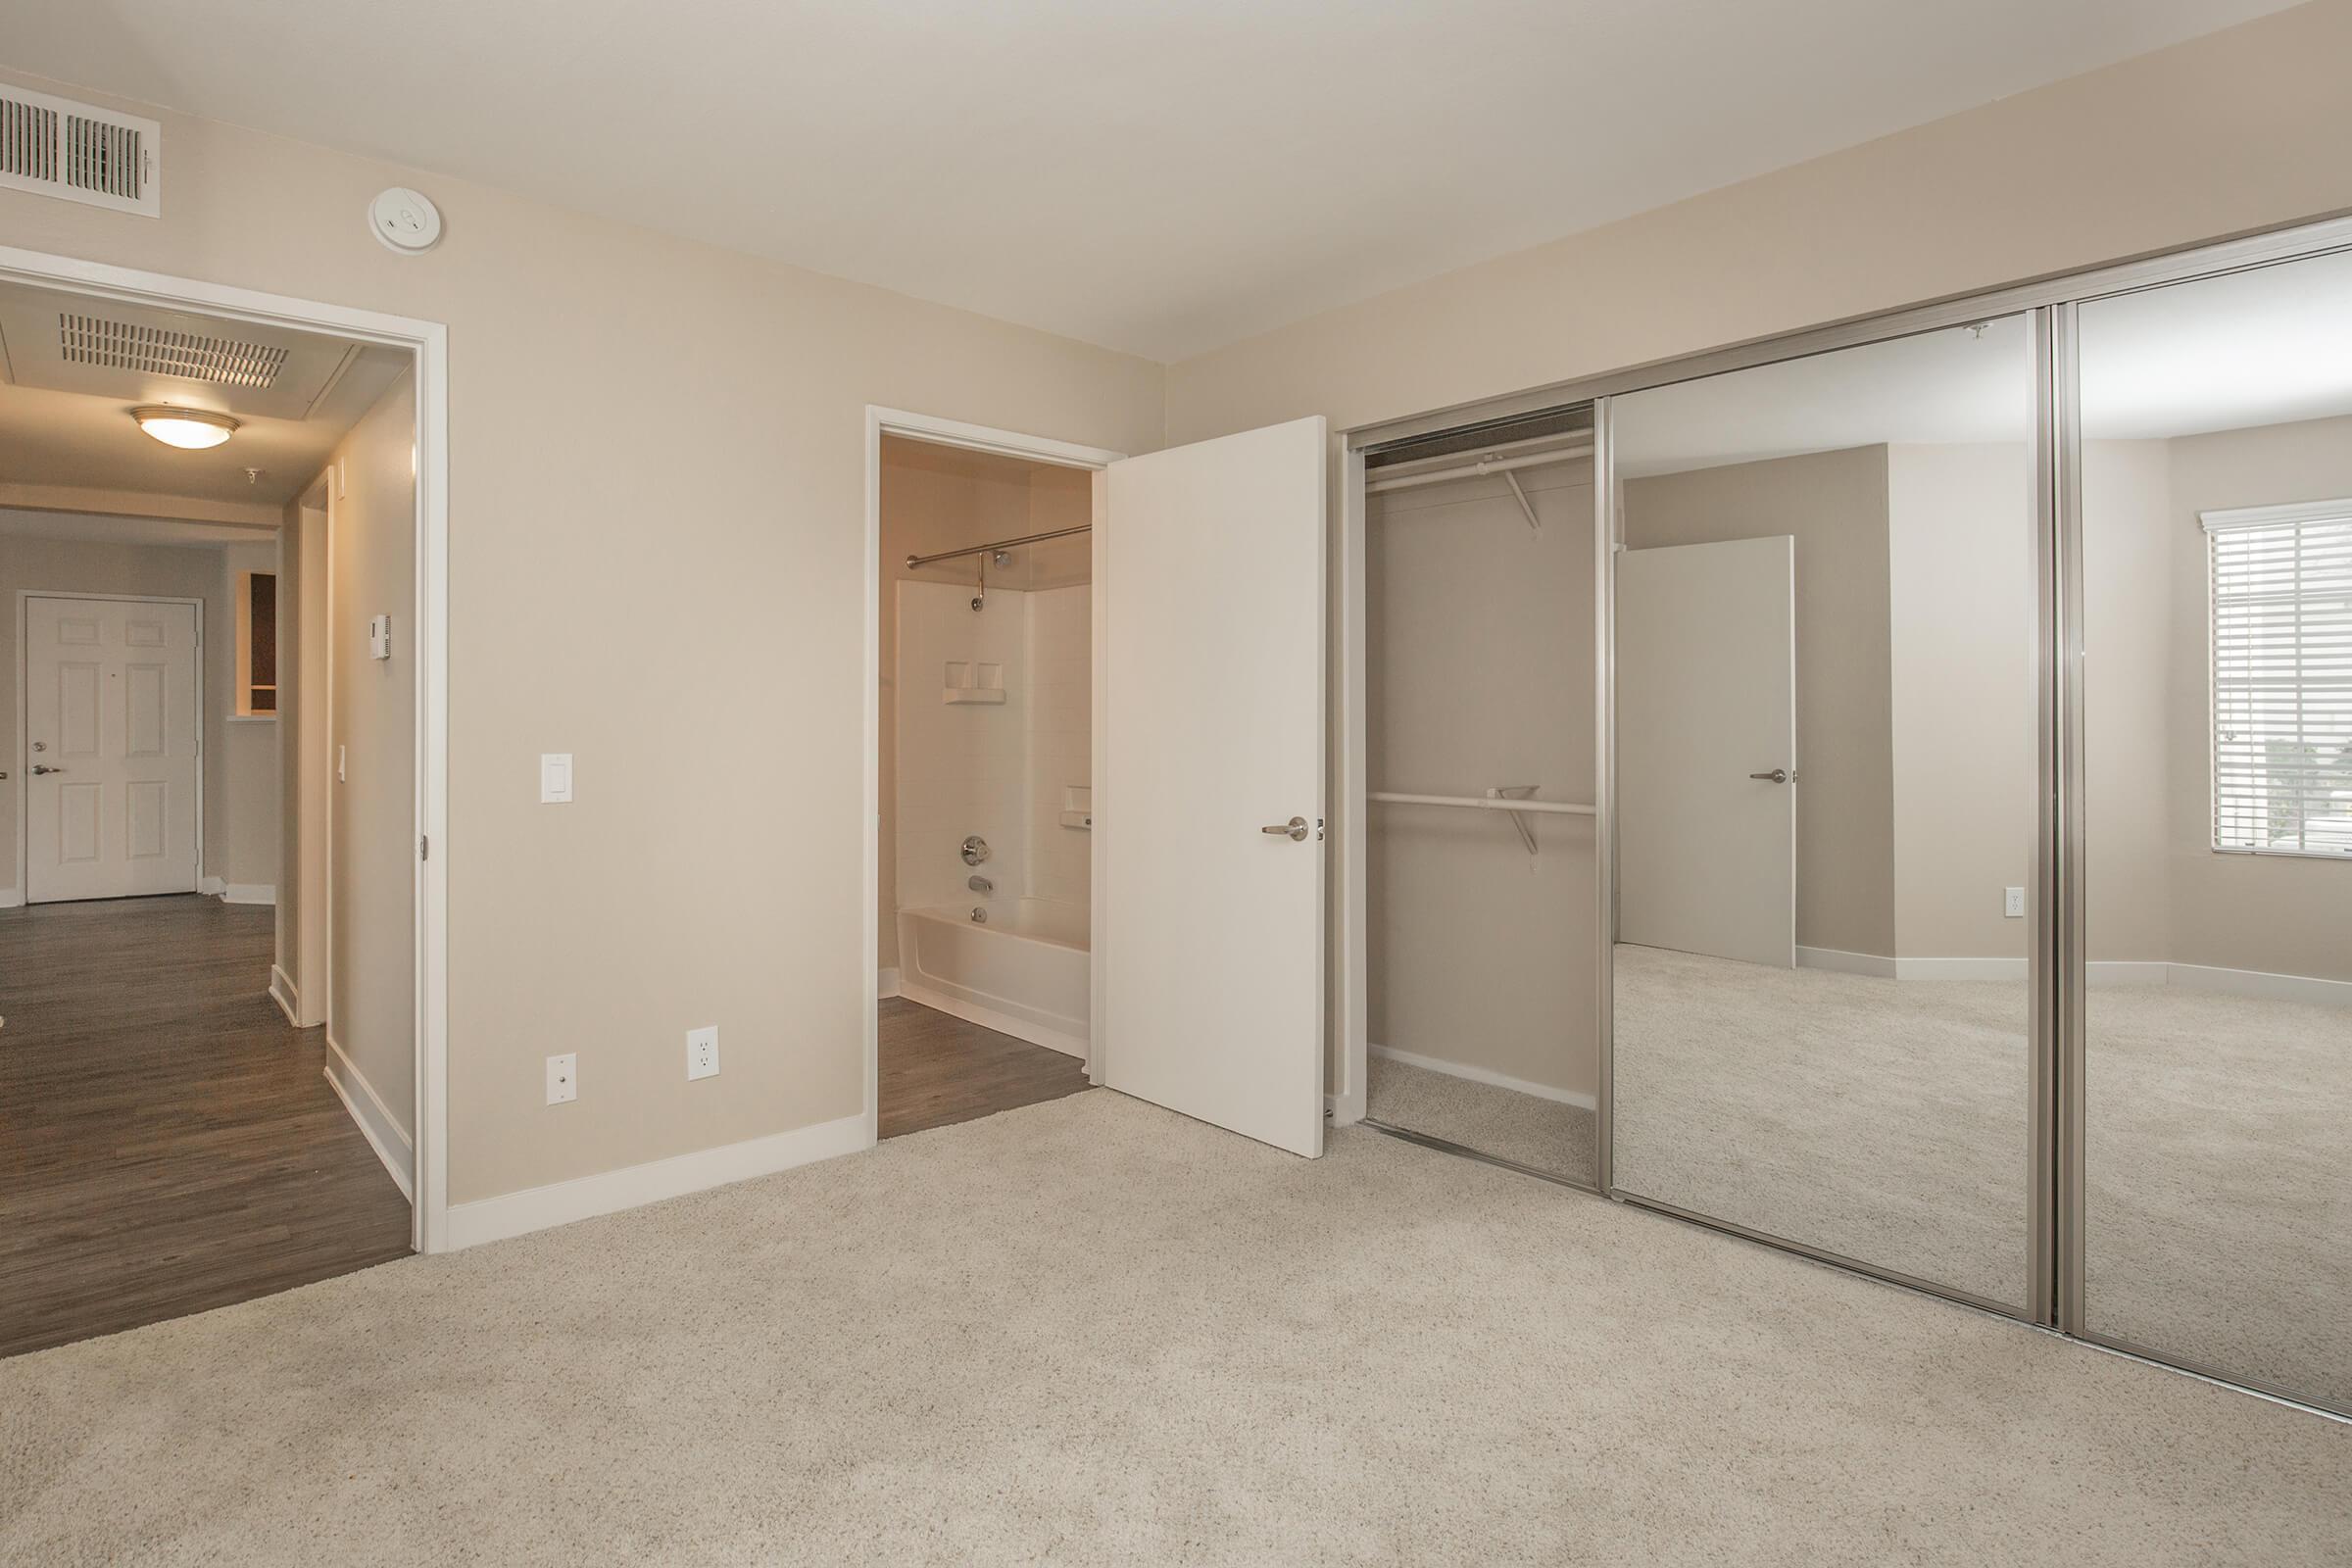 Unfurnished bedroom with mirror sliding closet doors